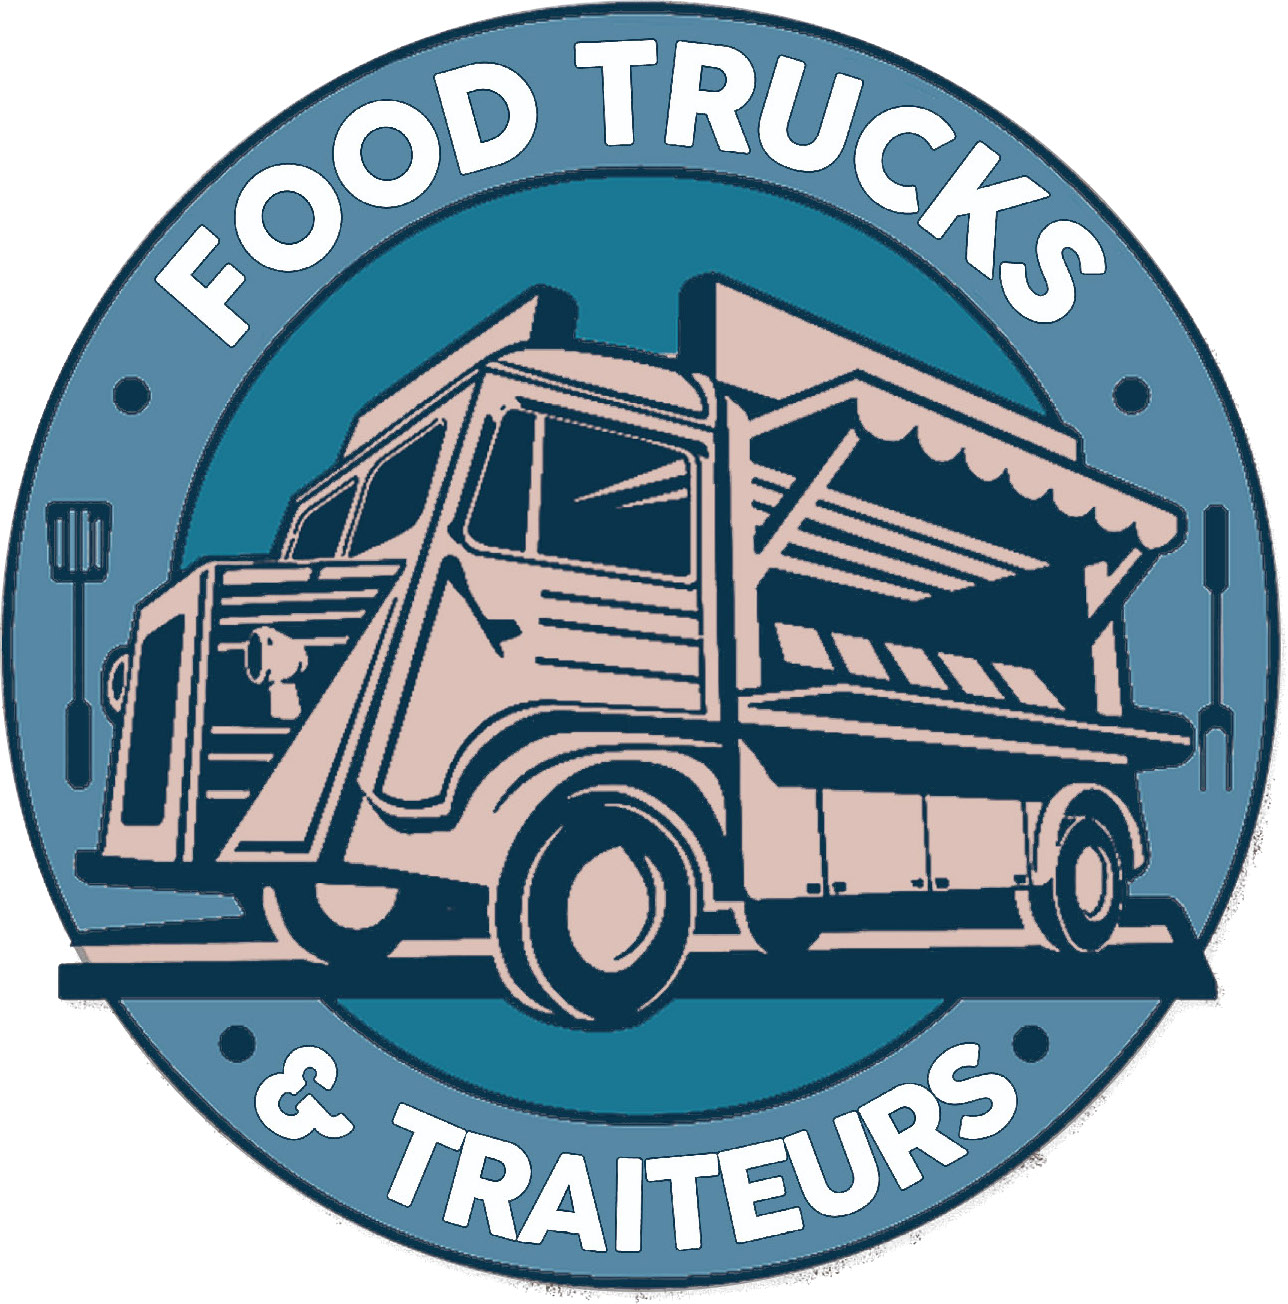 https://lafabriquedesgros.fr/wp-content/uploads/2018/09/food_truck_logo.jpg